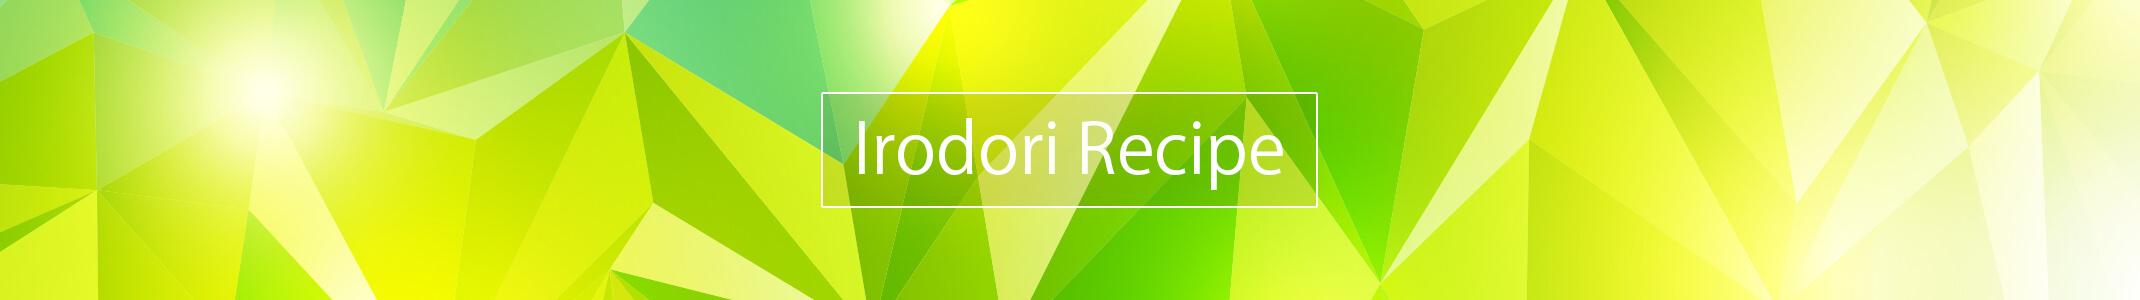 irodorirecipe